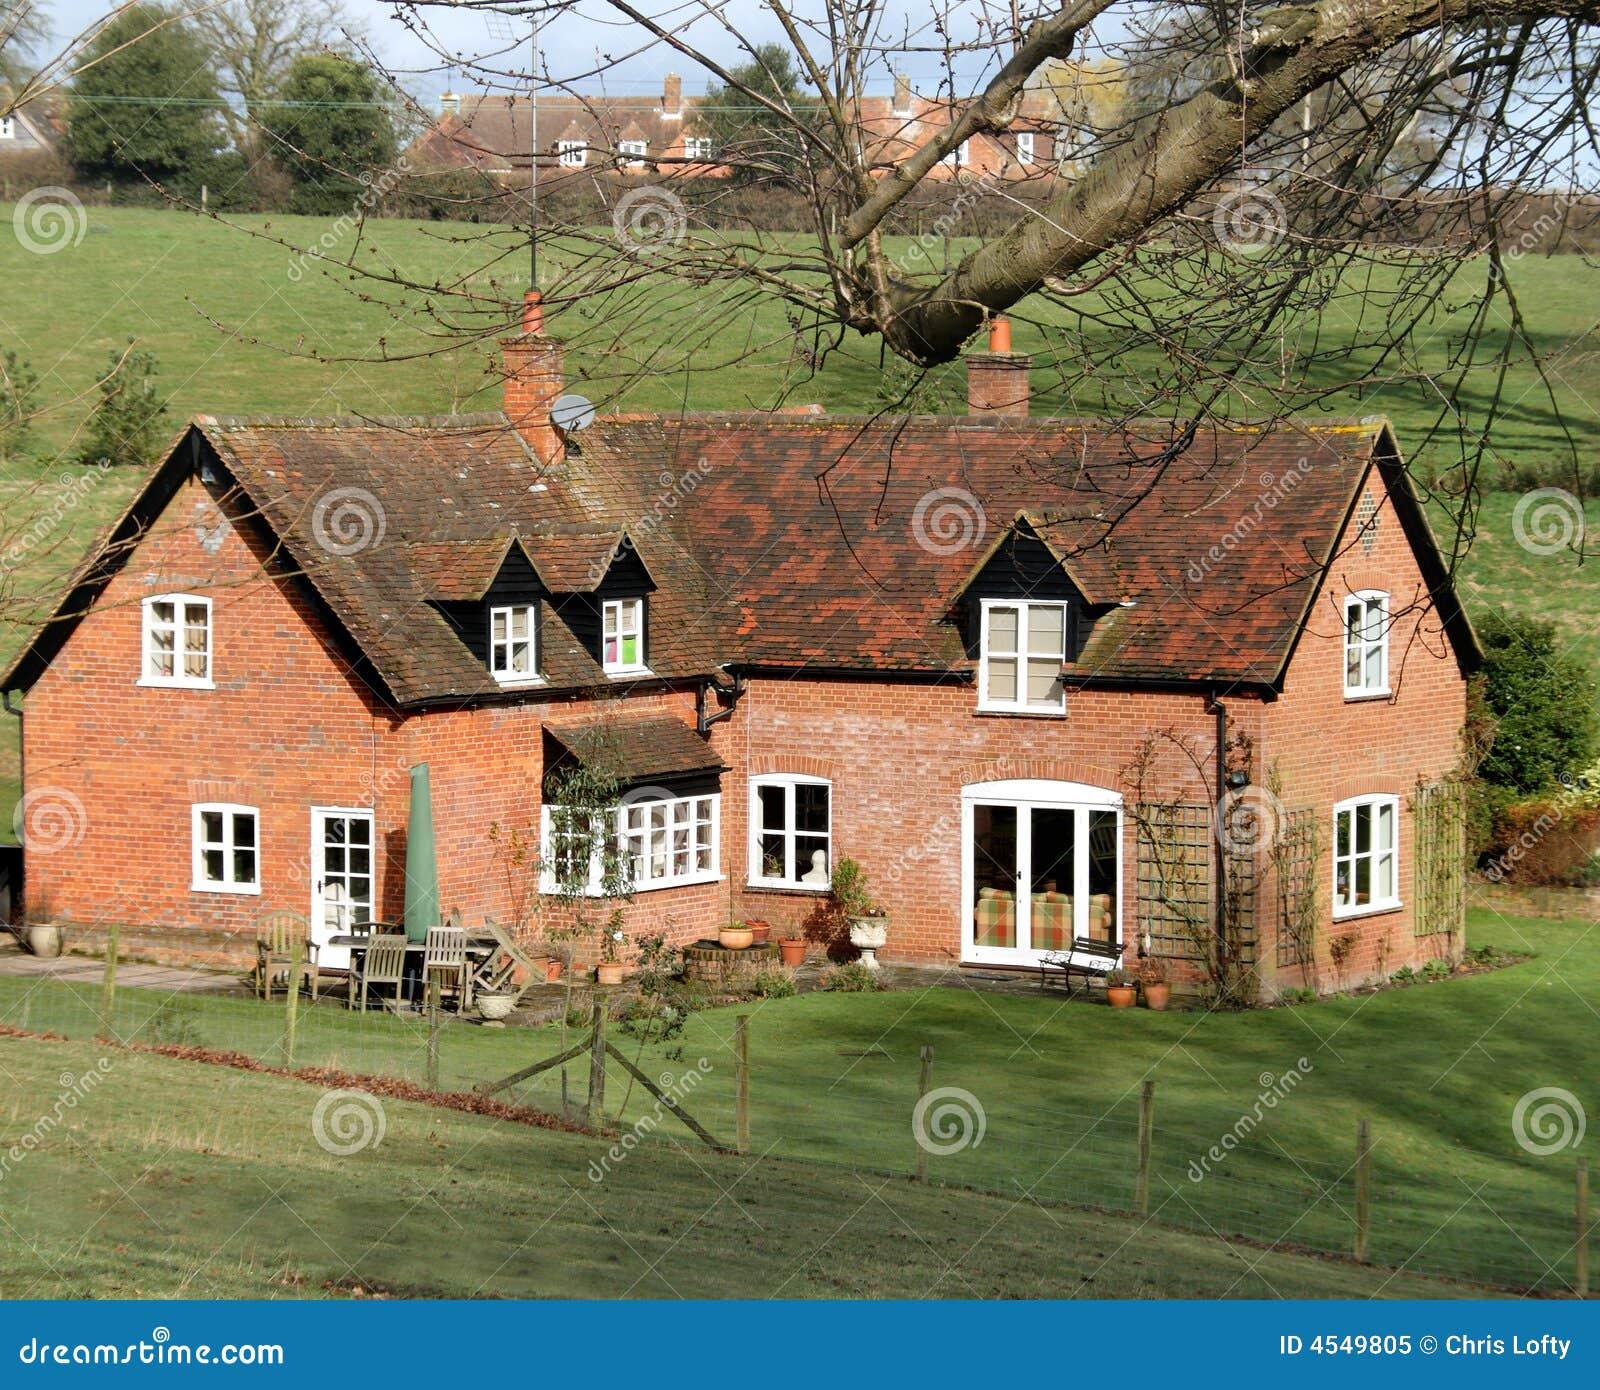 Casa rural inglesa del ladrillo rojo imagen de archivo for Casa rural mansion terraplen seis